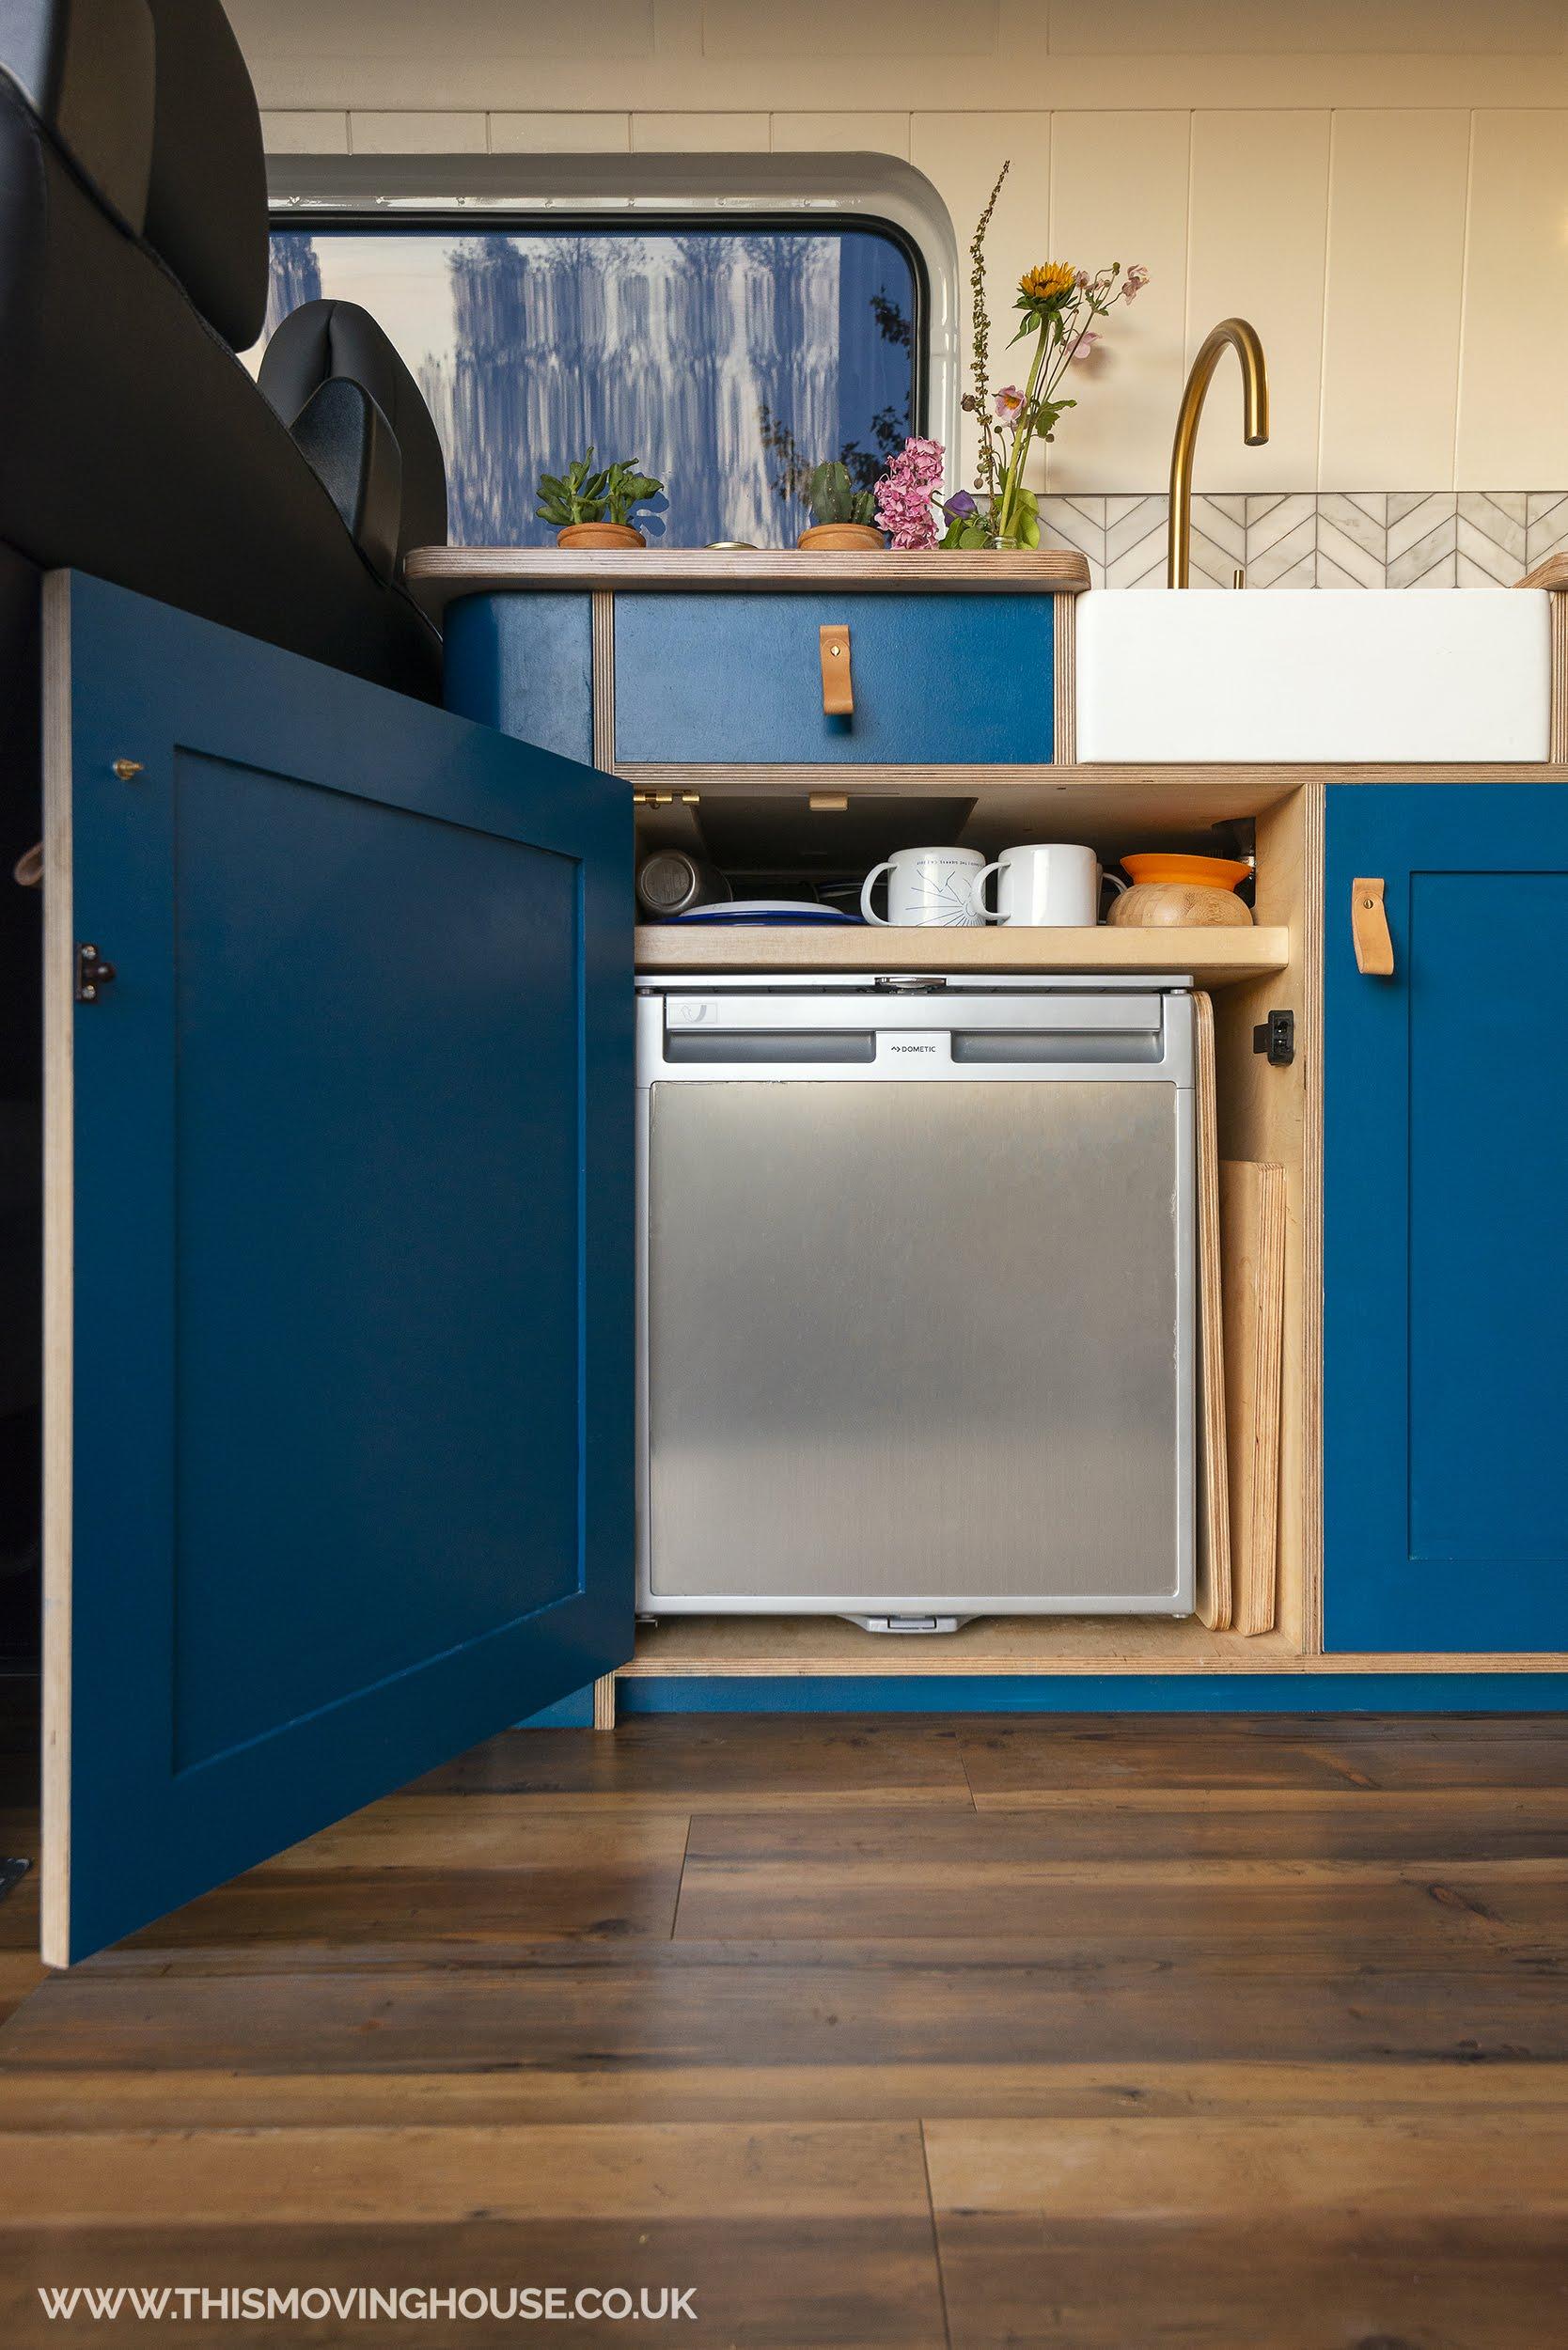 camper van fridge in a bespoke kitchen